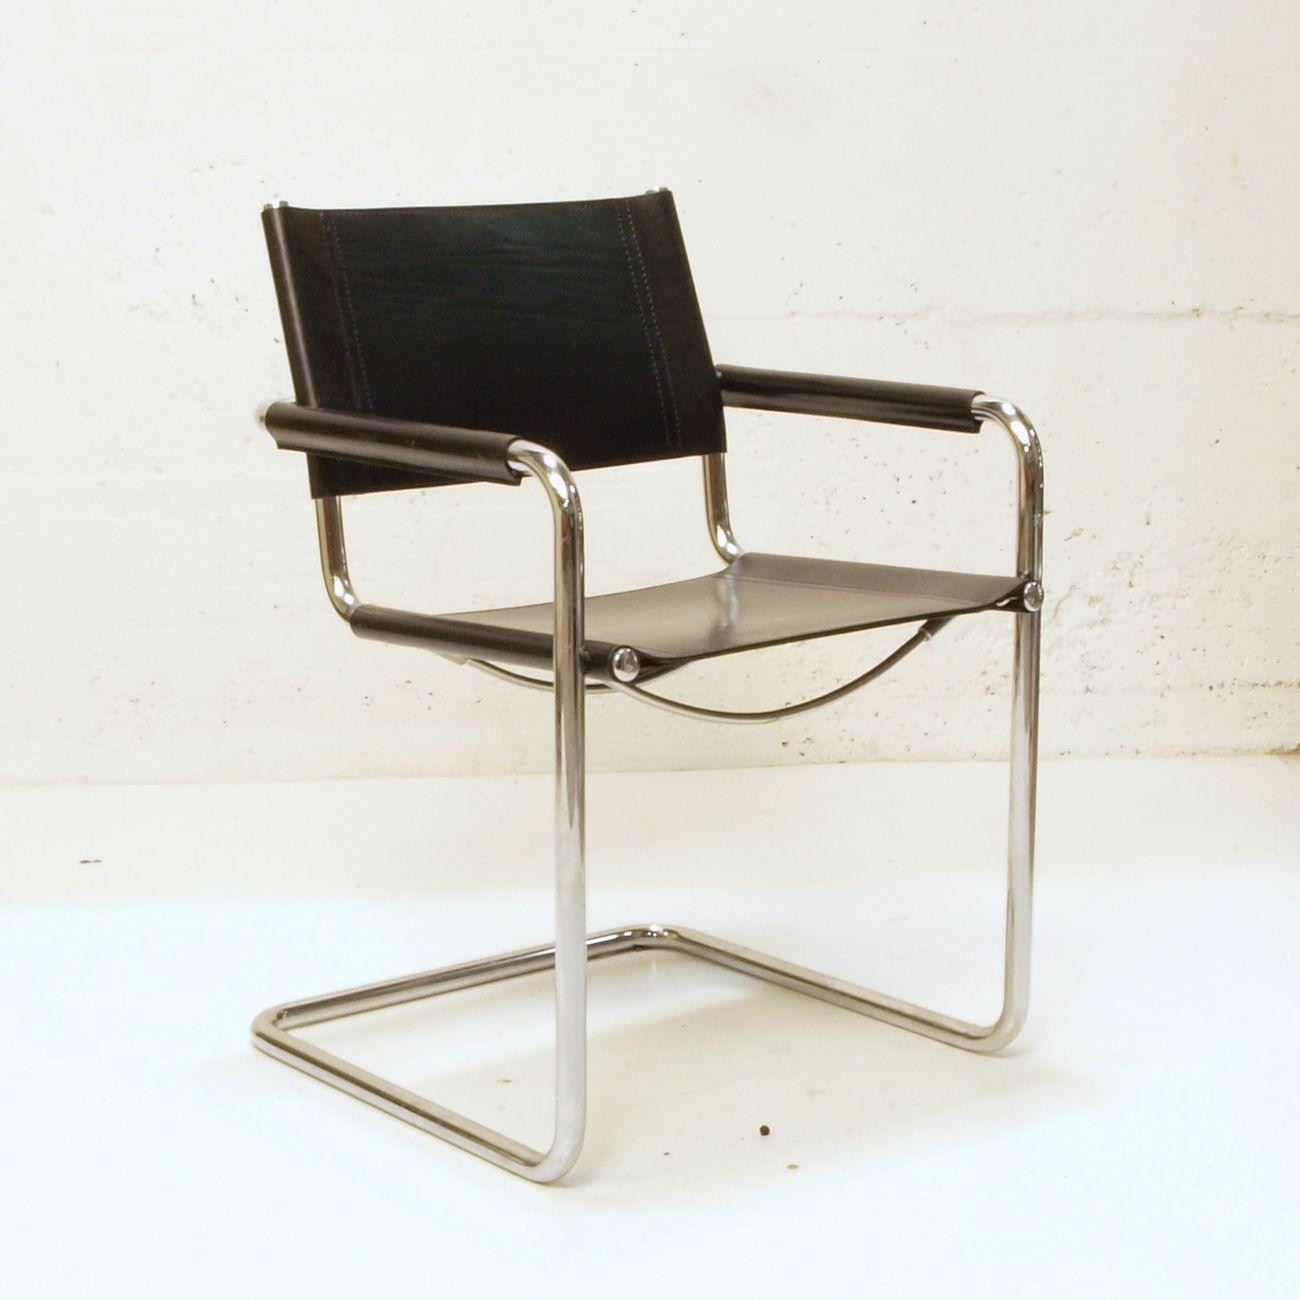 freischwinger mobilia italia m bel z rich vintagem bel